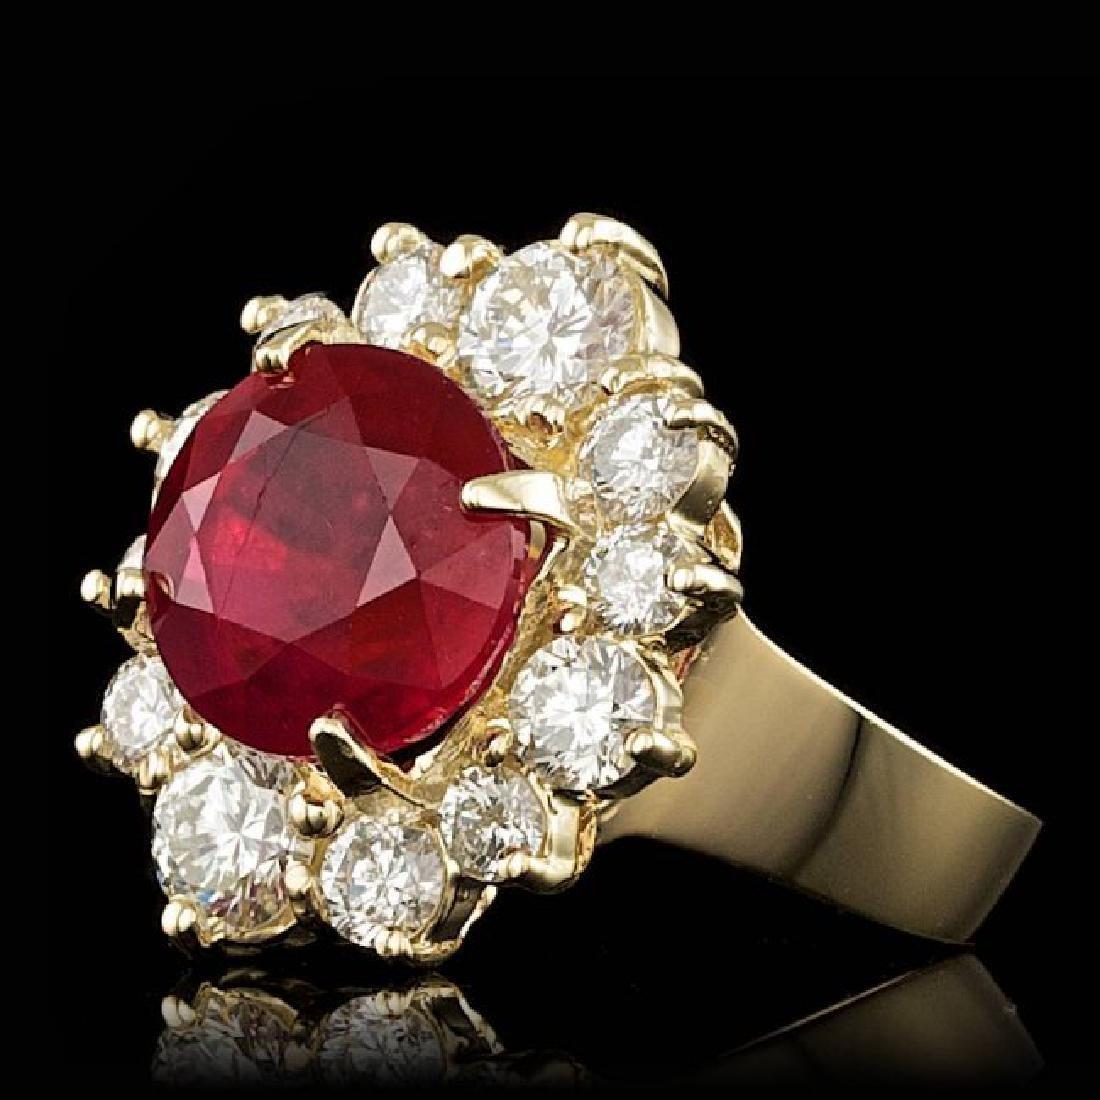 14k Yellow Gold 5.50ct Ruby 1.85ct Diamond Ring - 2